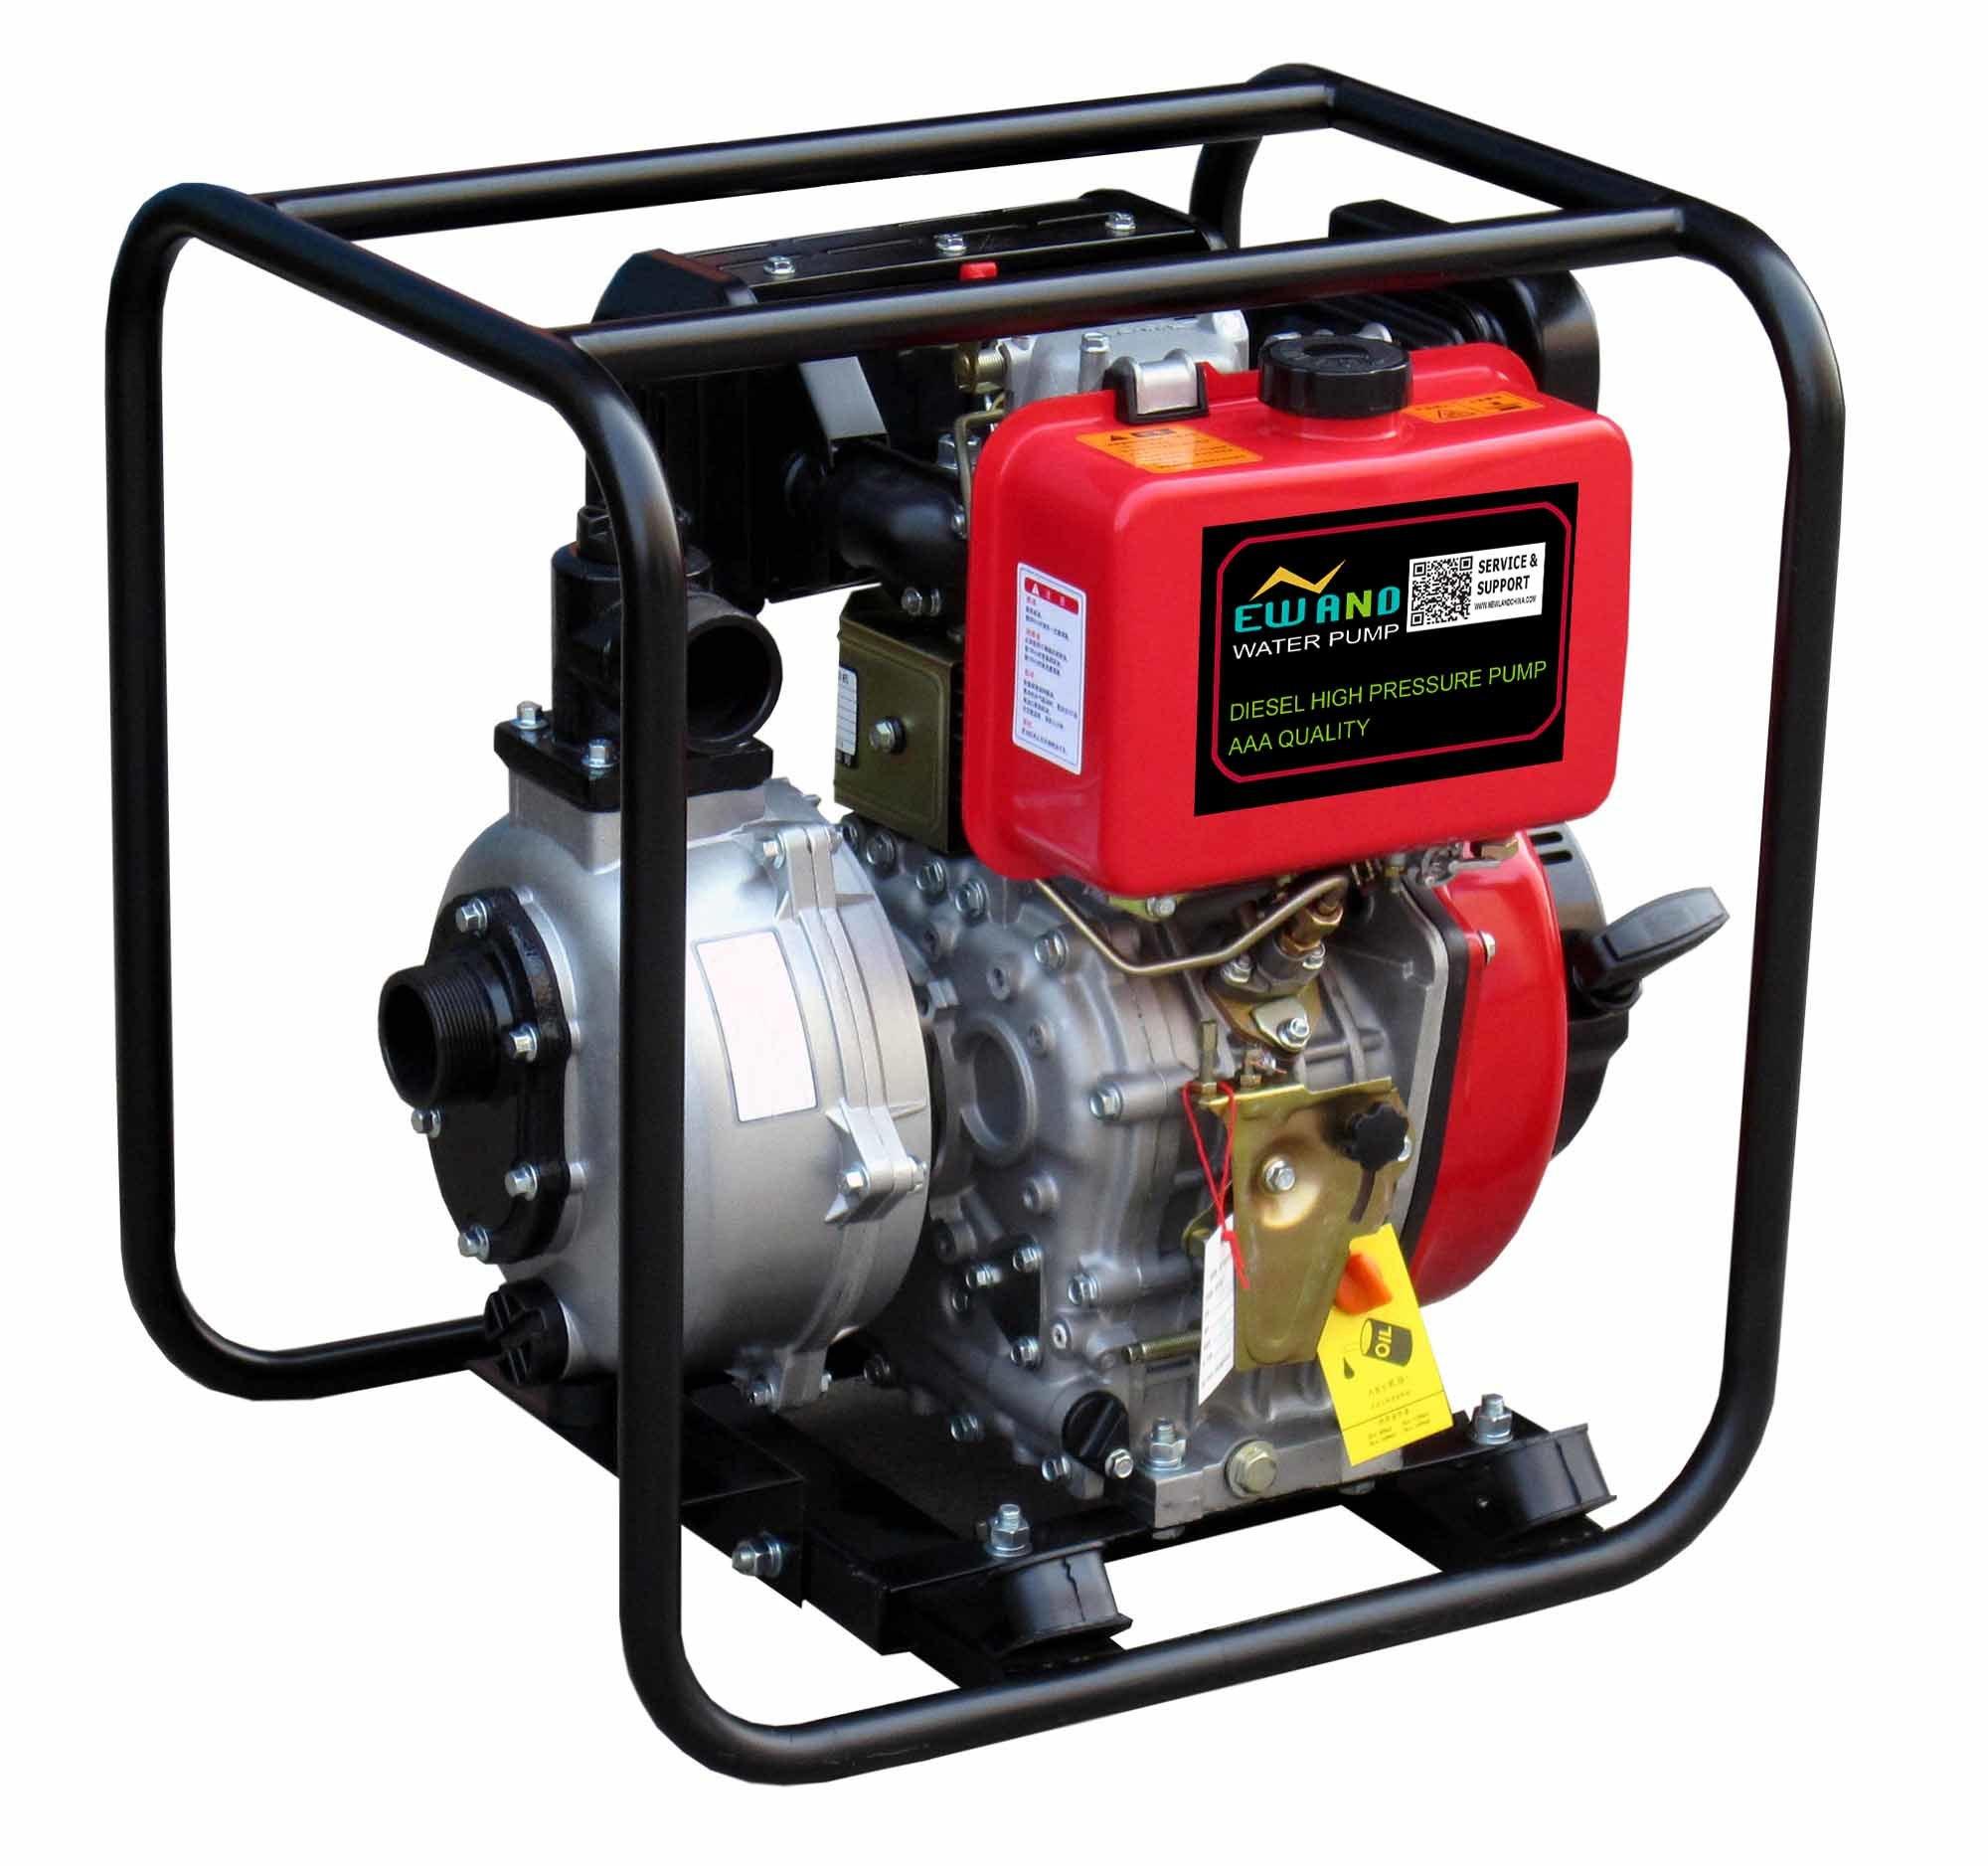 China 2 Inch Manual Diesel High Pressure Water Pump (DP20H) - China Pump, Water  Pump